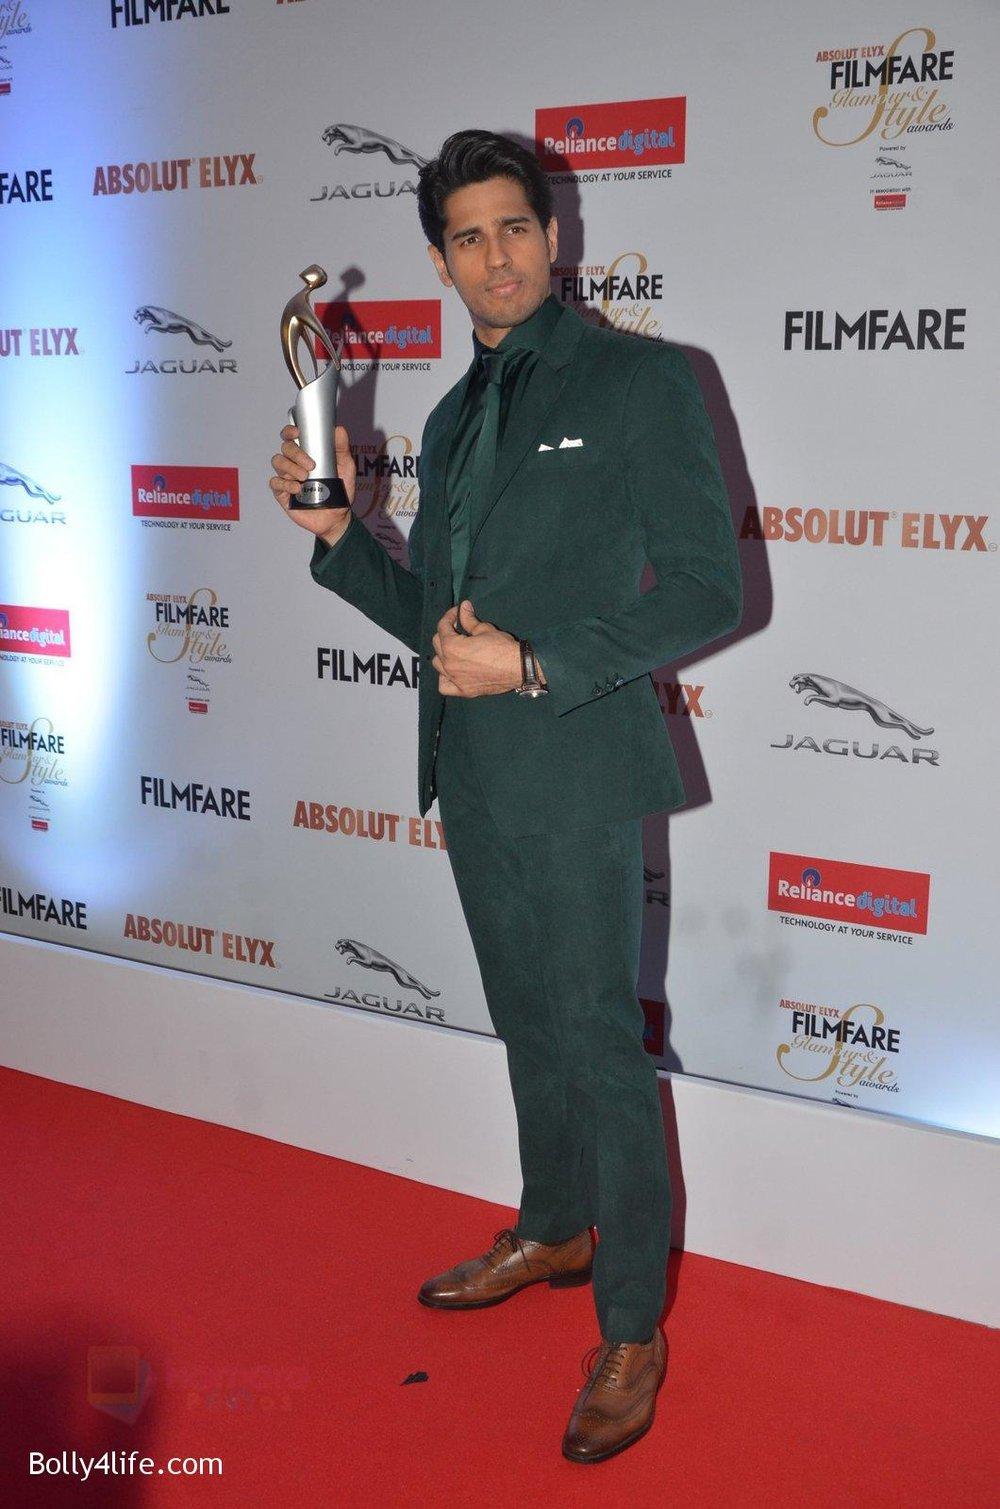 Sidharth-Malhotra-at-Filmfare-Glamour-Style-Awards-2016-in-Mumbai-on-15th-Oct-2016-2143.jpg